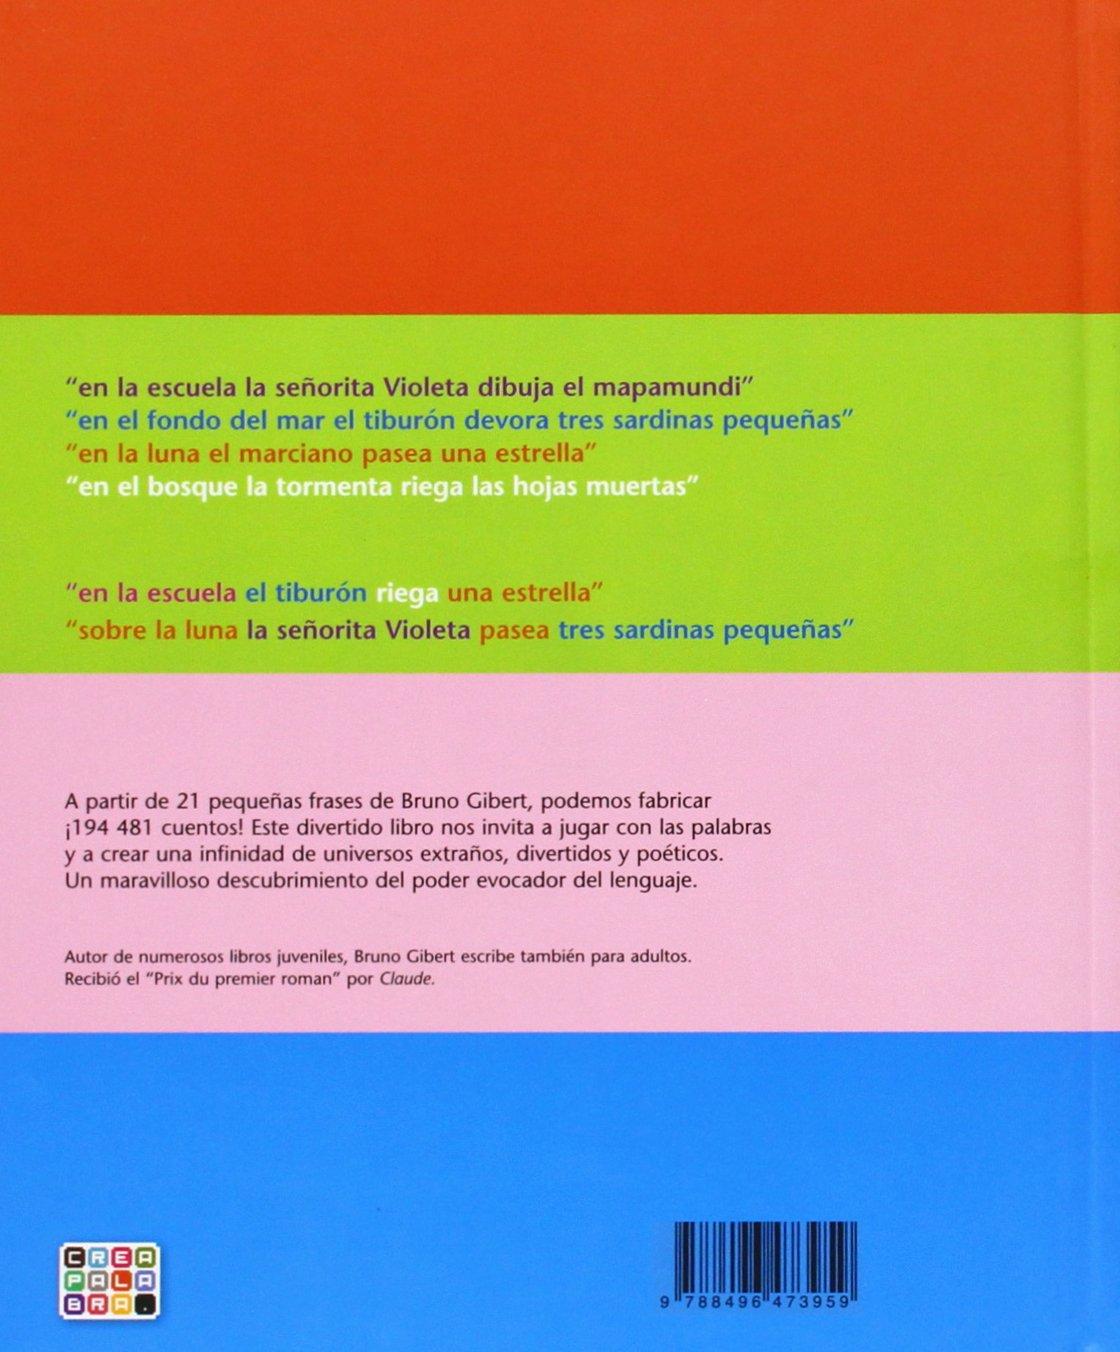 Mi pequeña fábrica de cuentos (Spanish Edition): Bruno Gibert: 9788496473959: Amazon.com: Books